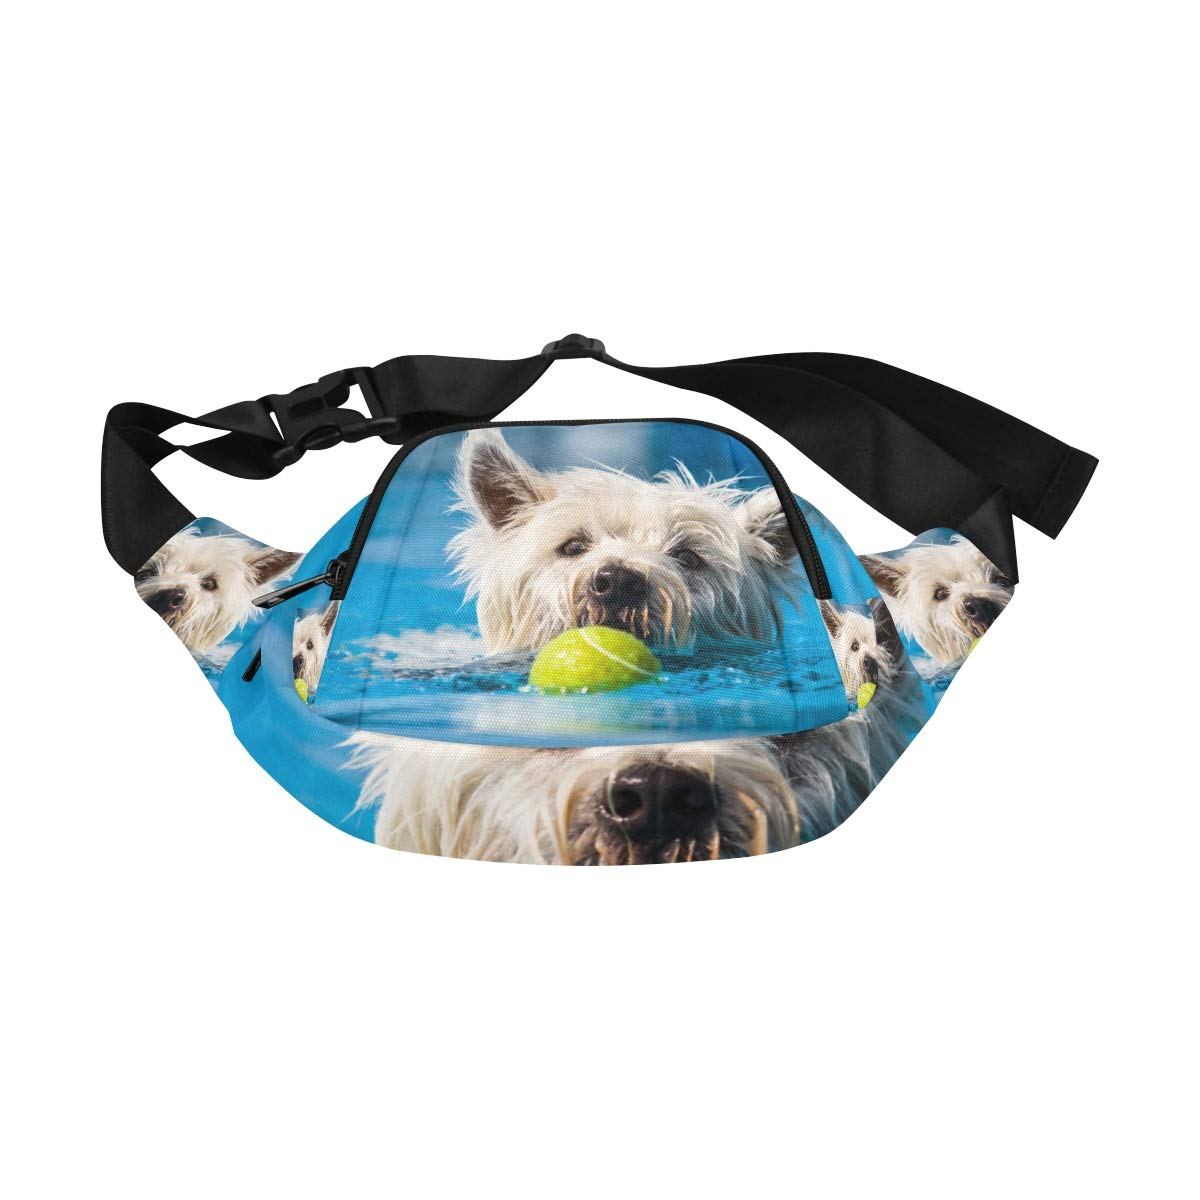 Happy Dog Swimming Dog Smiling Fenny Packs Waist Bags Adjustable Belt Waterproof Nylon Travel Running Sport Vacation Party For Men Women Boys Girls Kids